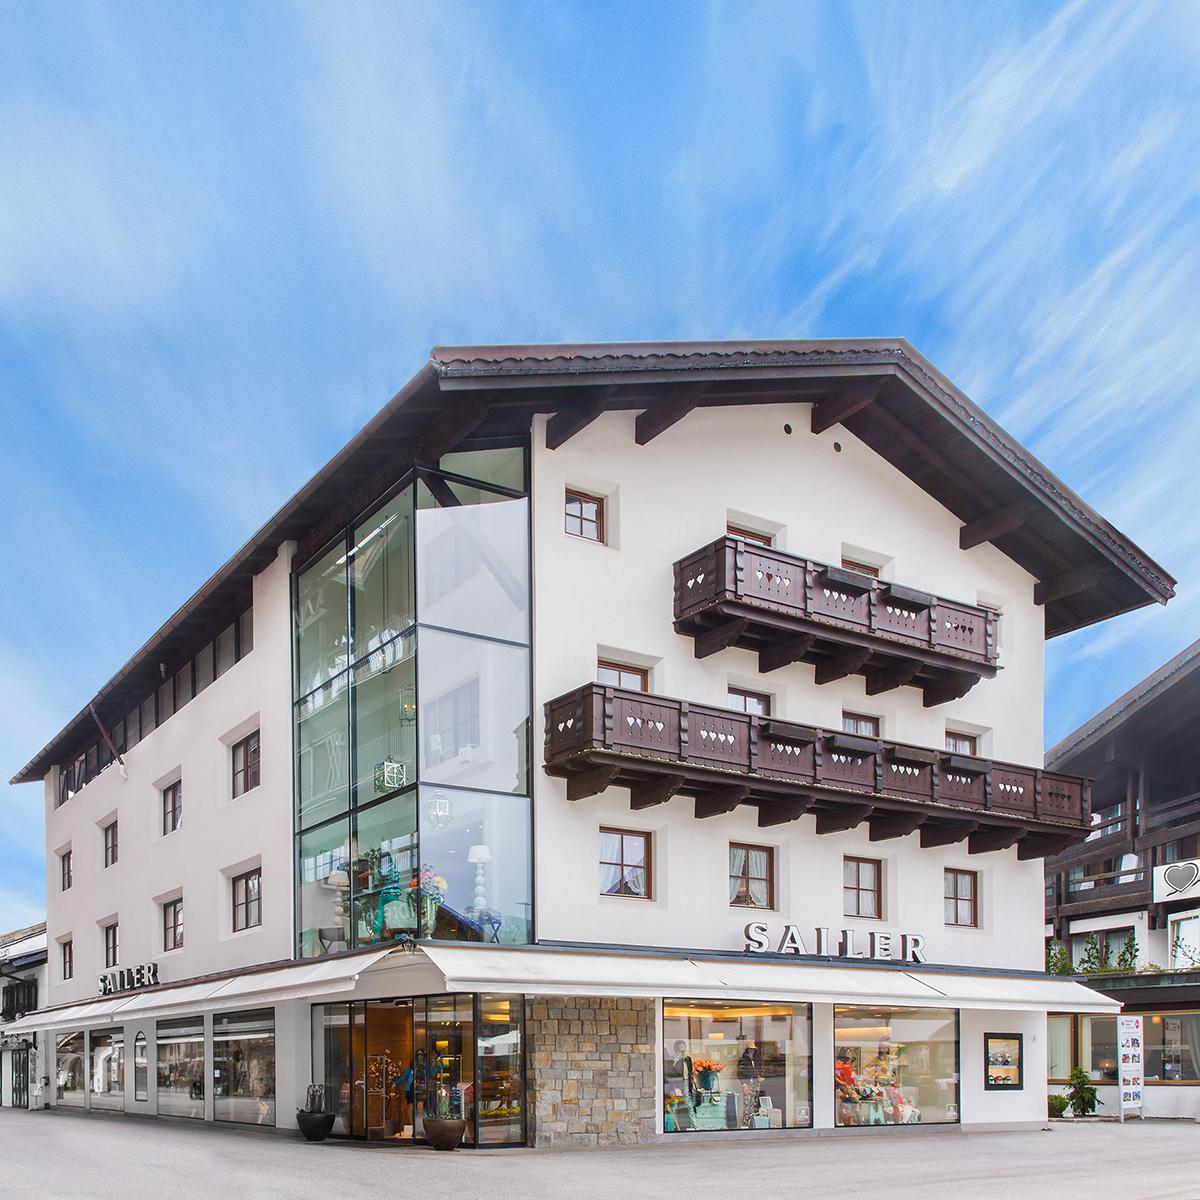 SAILER-Seefeld-Image-Hoover-Startseite-tirol-Austria